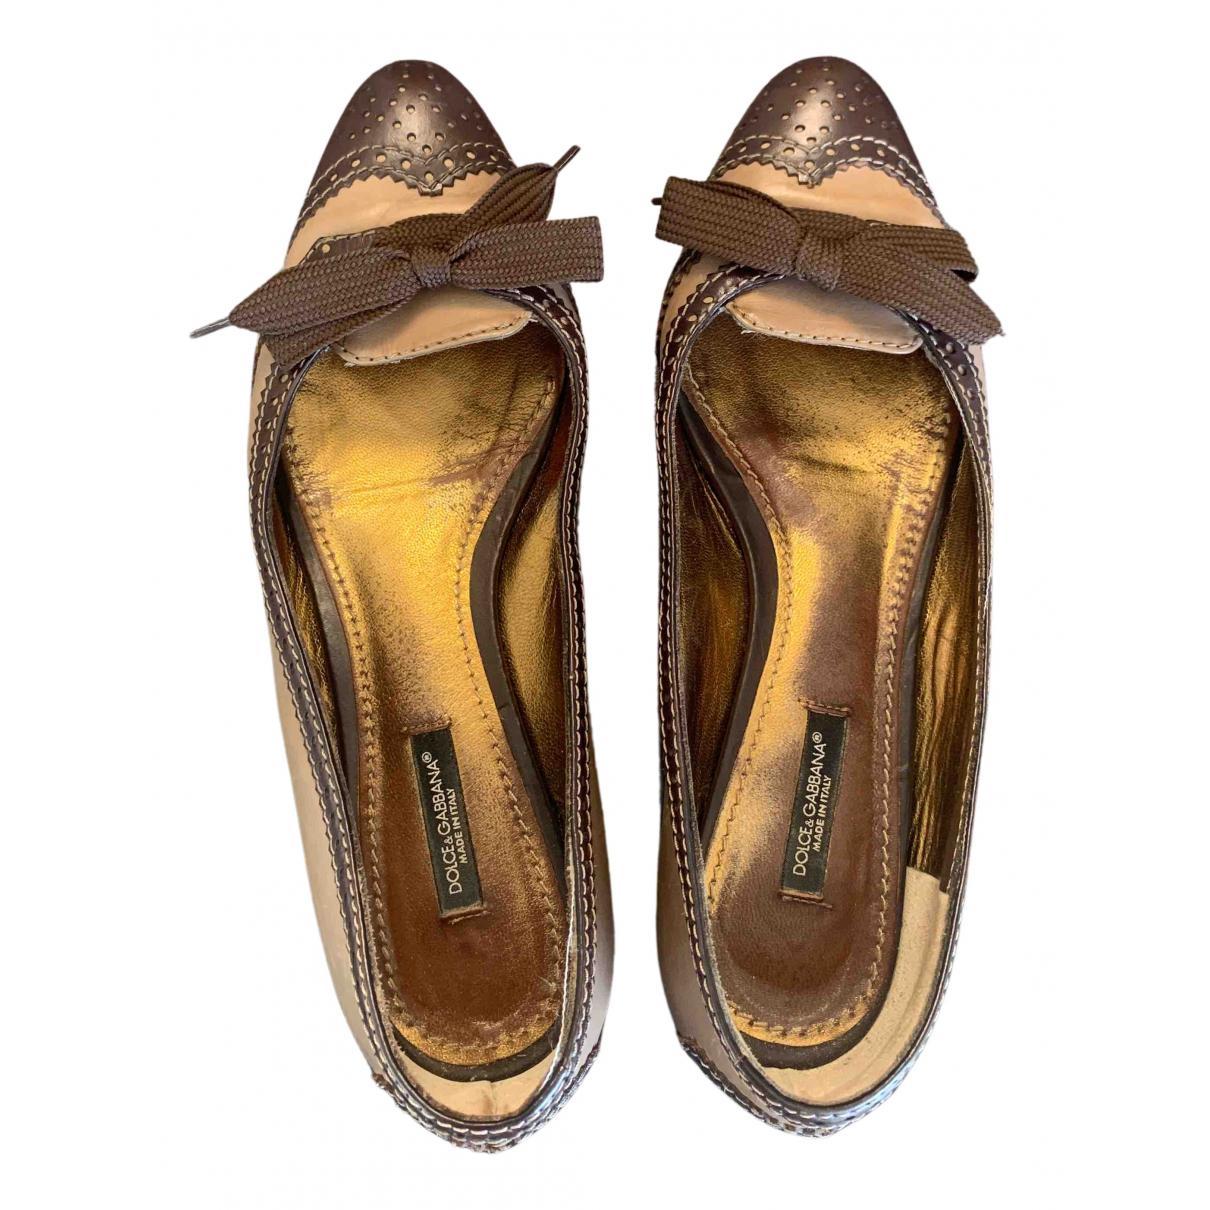 Dolce & Gabbana \N Ballerinas in  Braun Leder